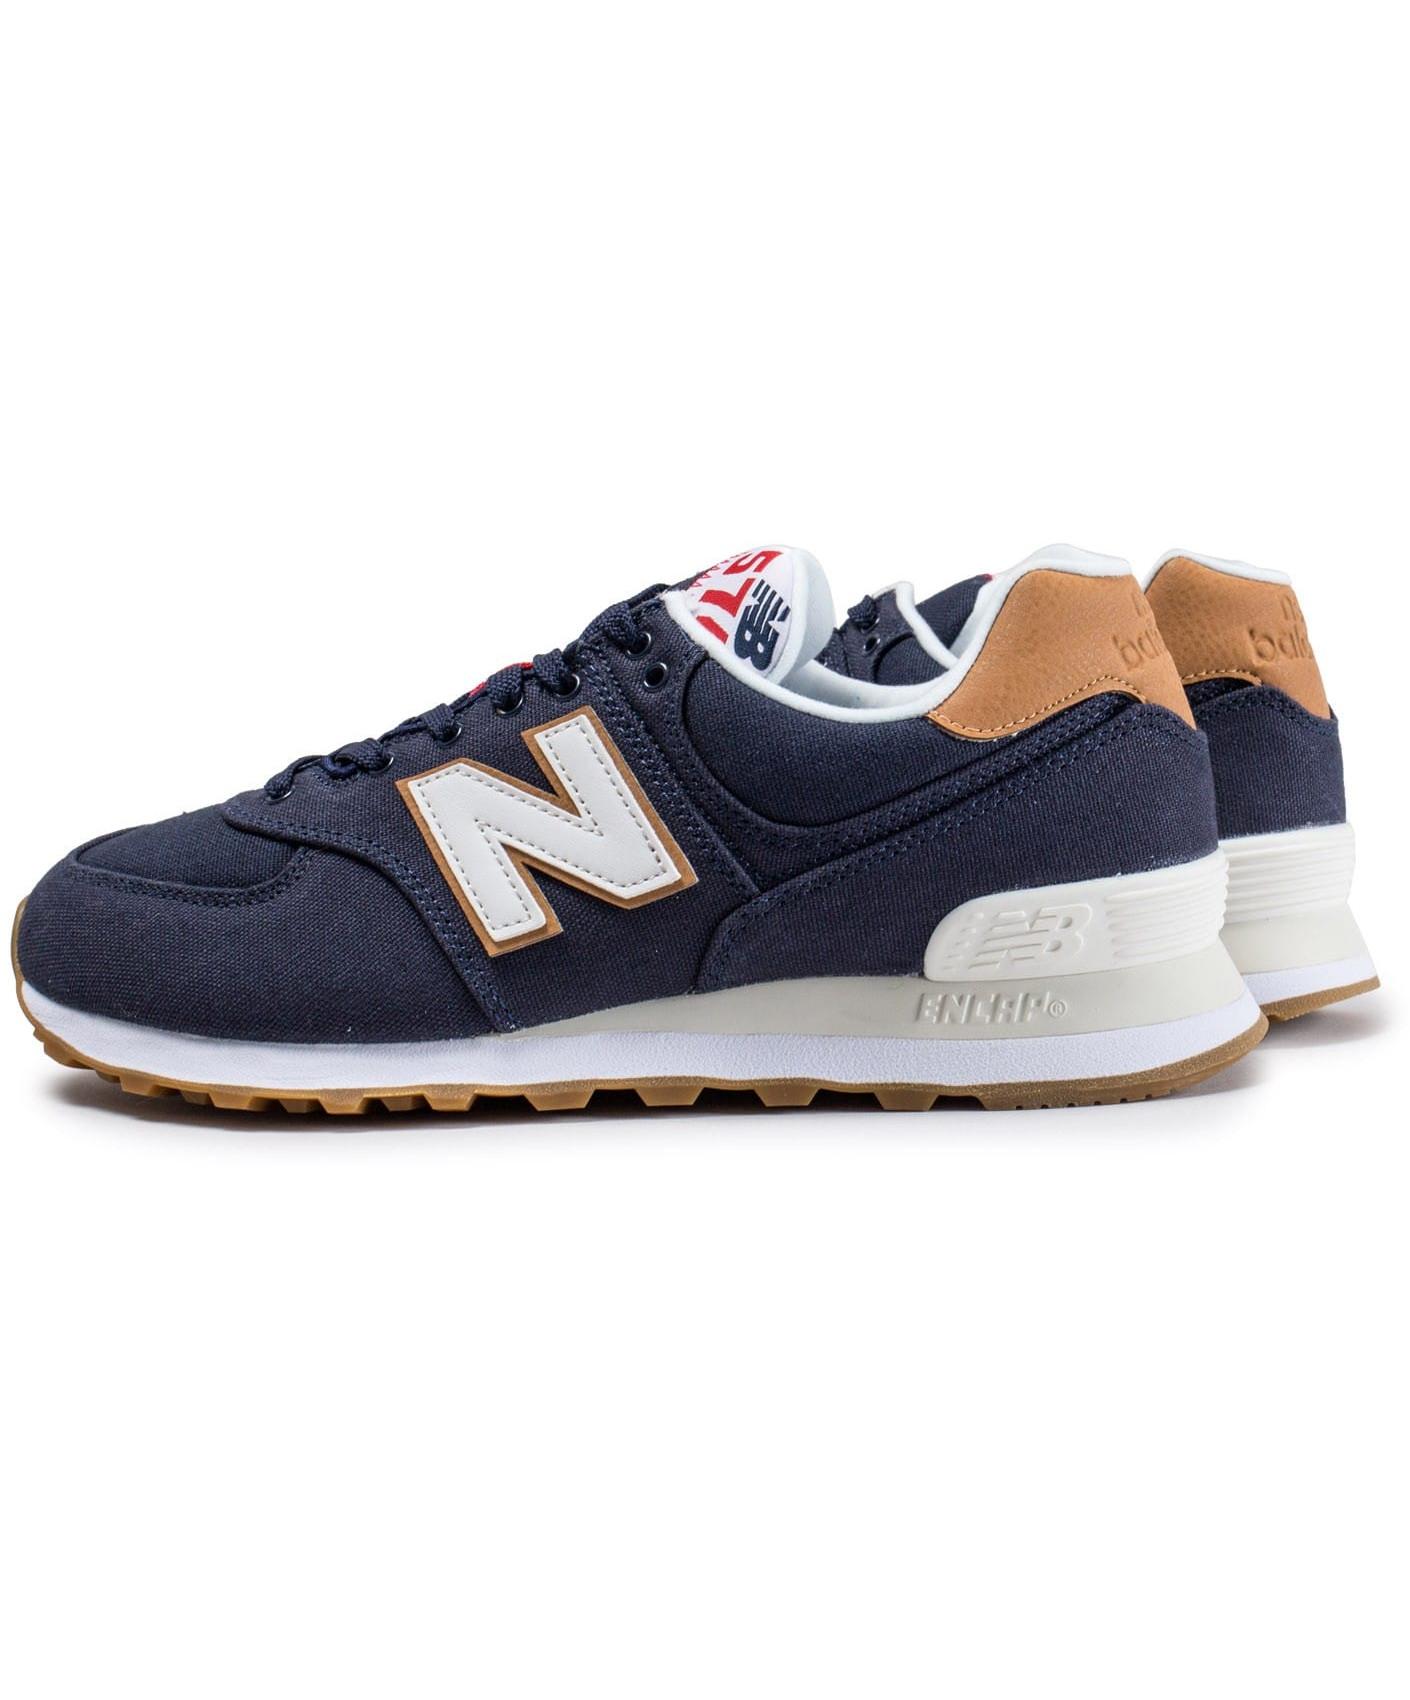 NEW Balance Scarpe Sneaker ml574 Uomo Scarpe Da Ginnastica Canvas Scarpe Uomo Beige